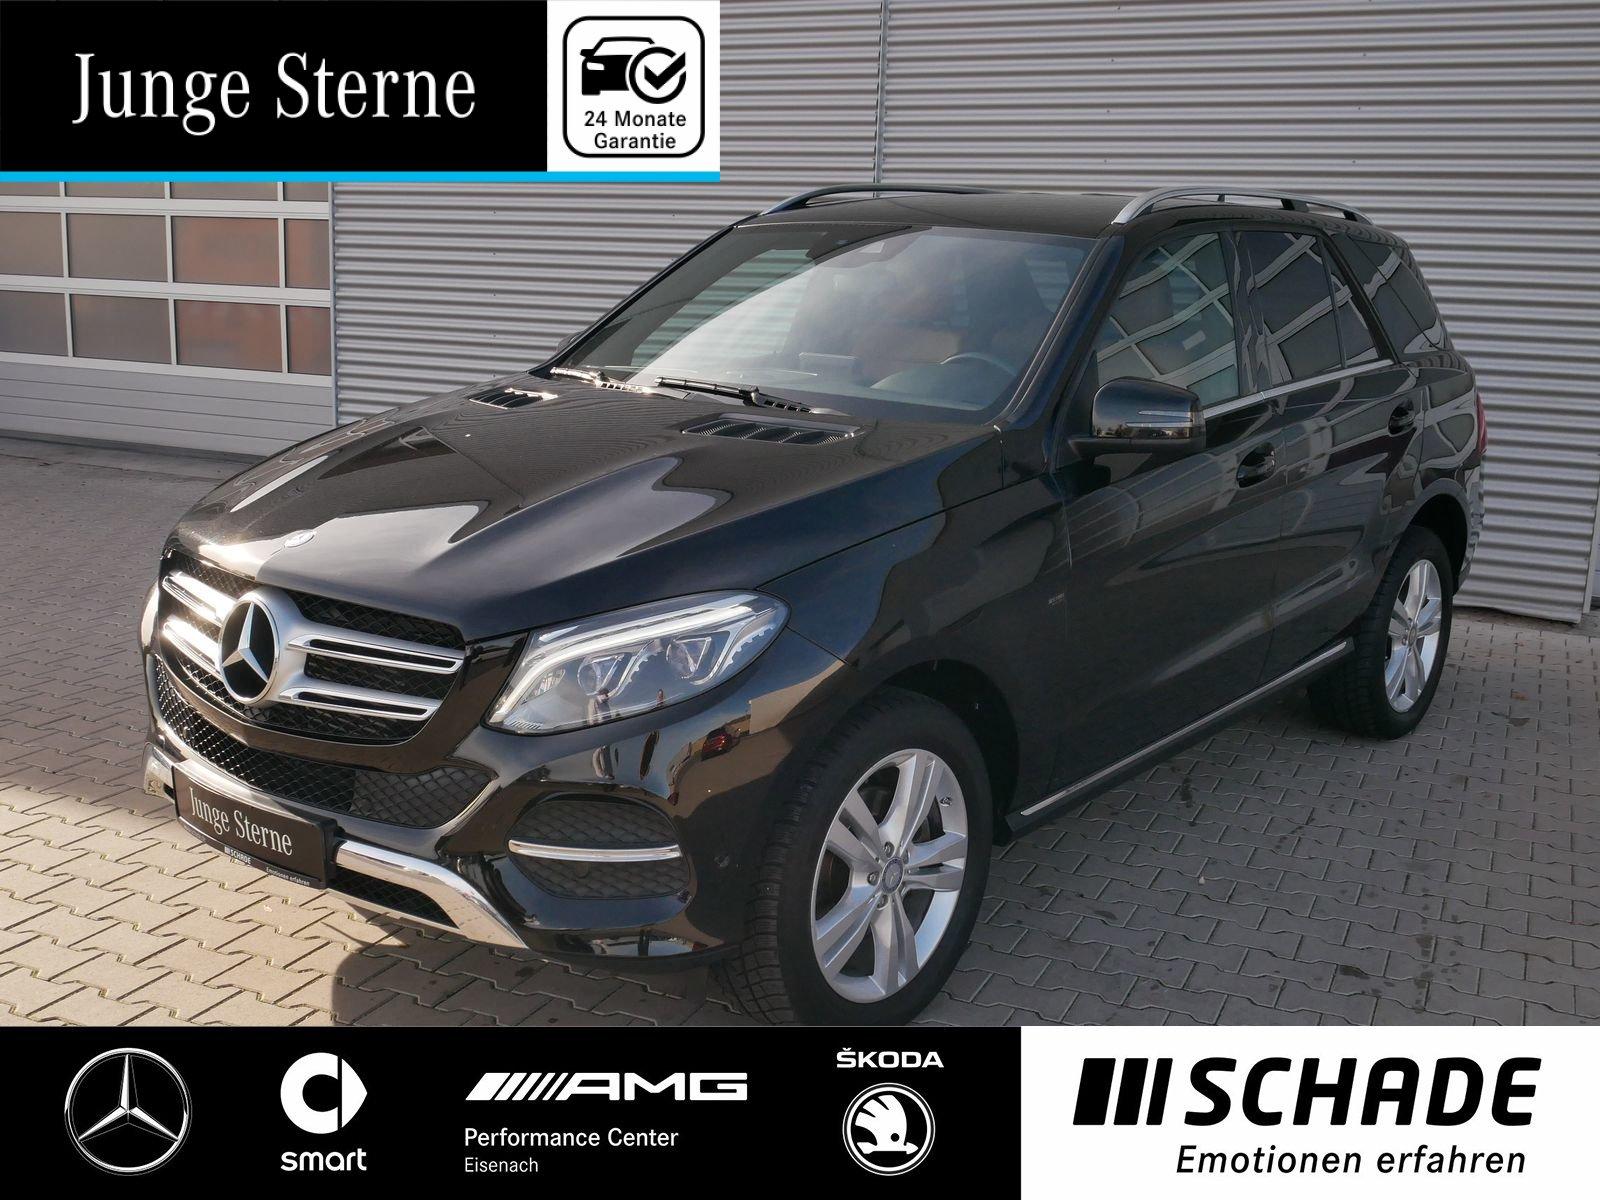 Mercedes-Benz GLE 350 d 4M Comand*LED* Leder Braun*Easy-Pack*, Jahr 2015, diesel